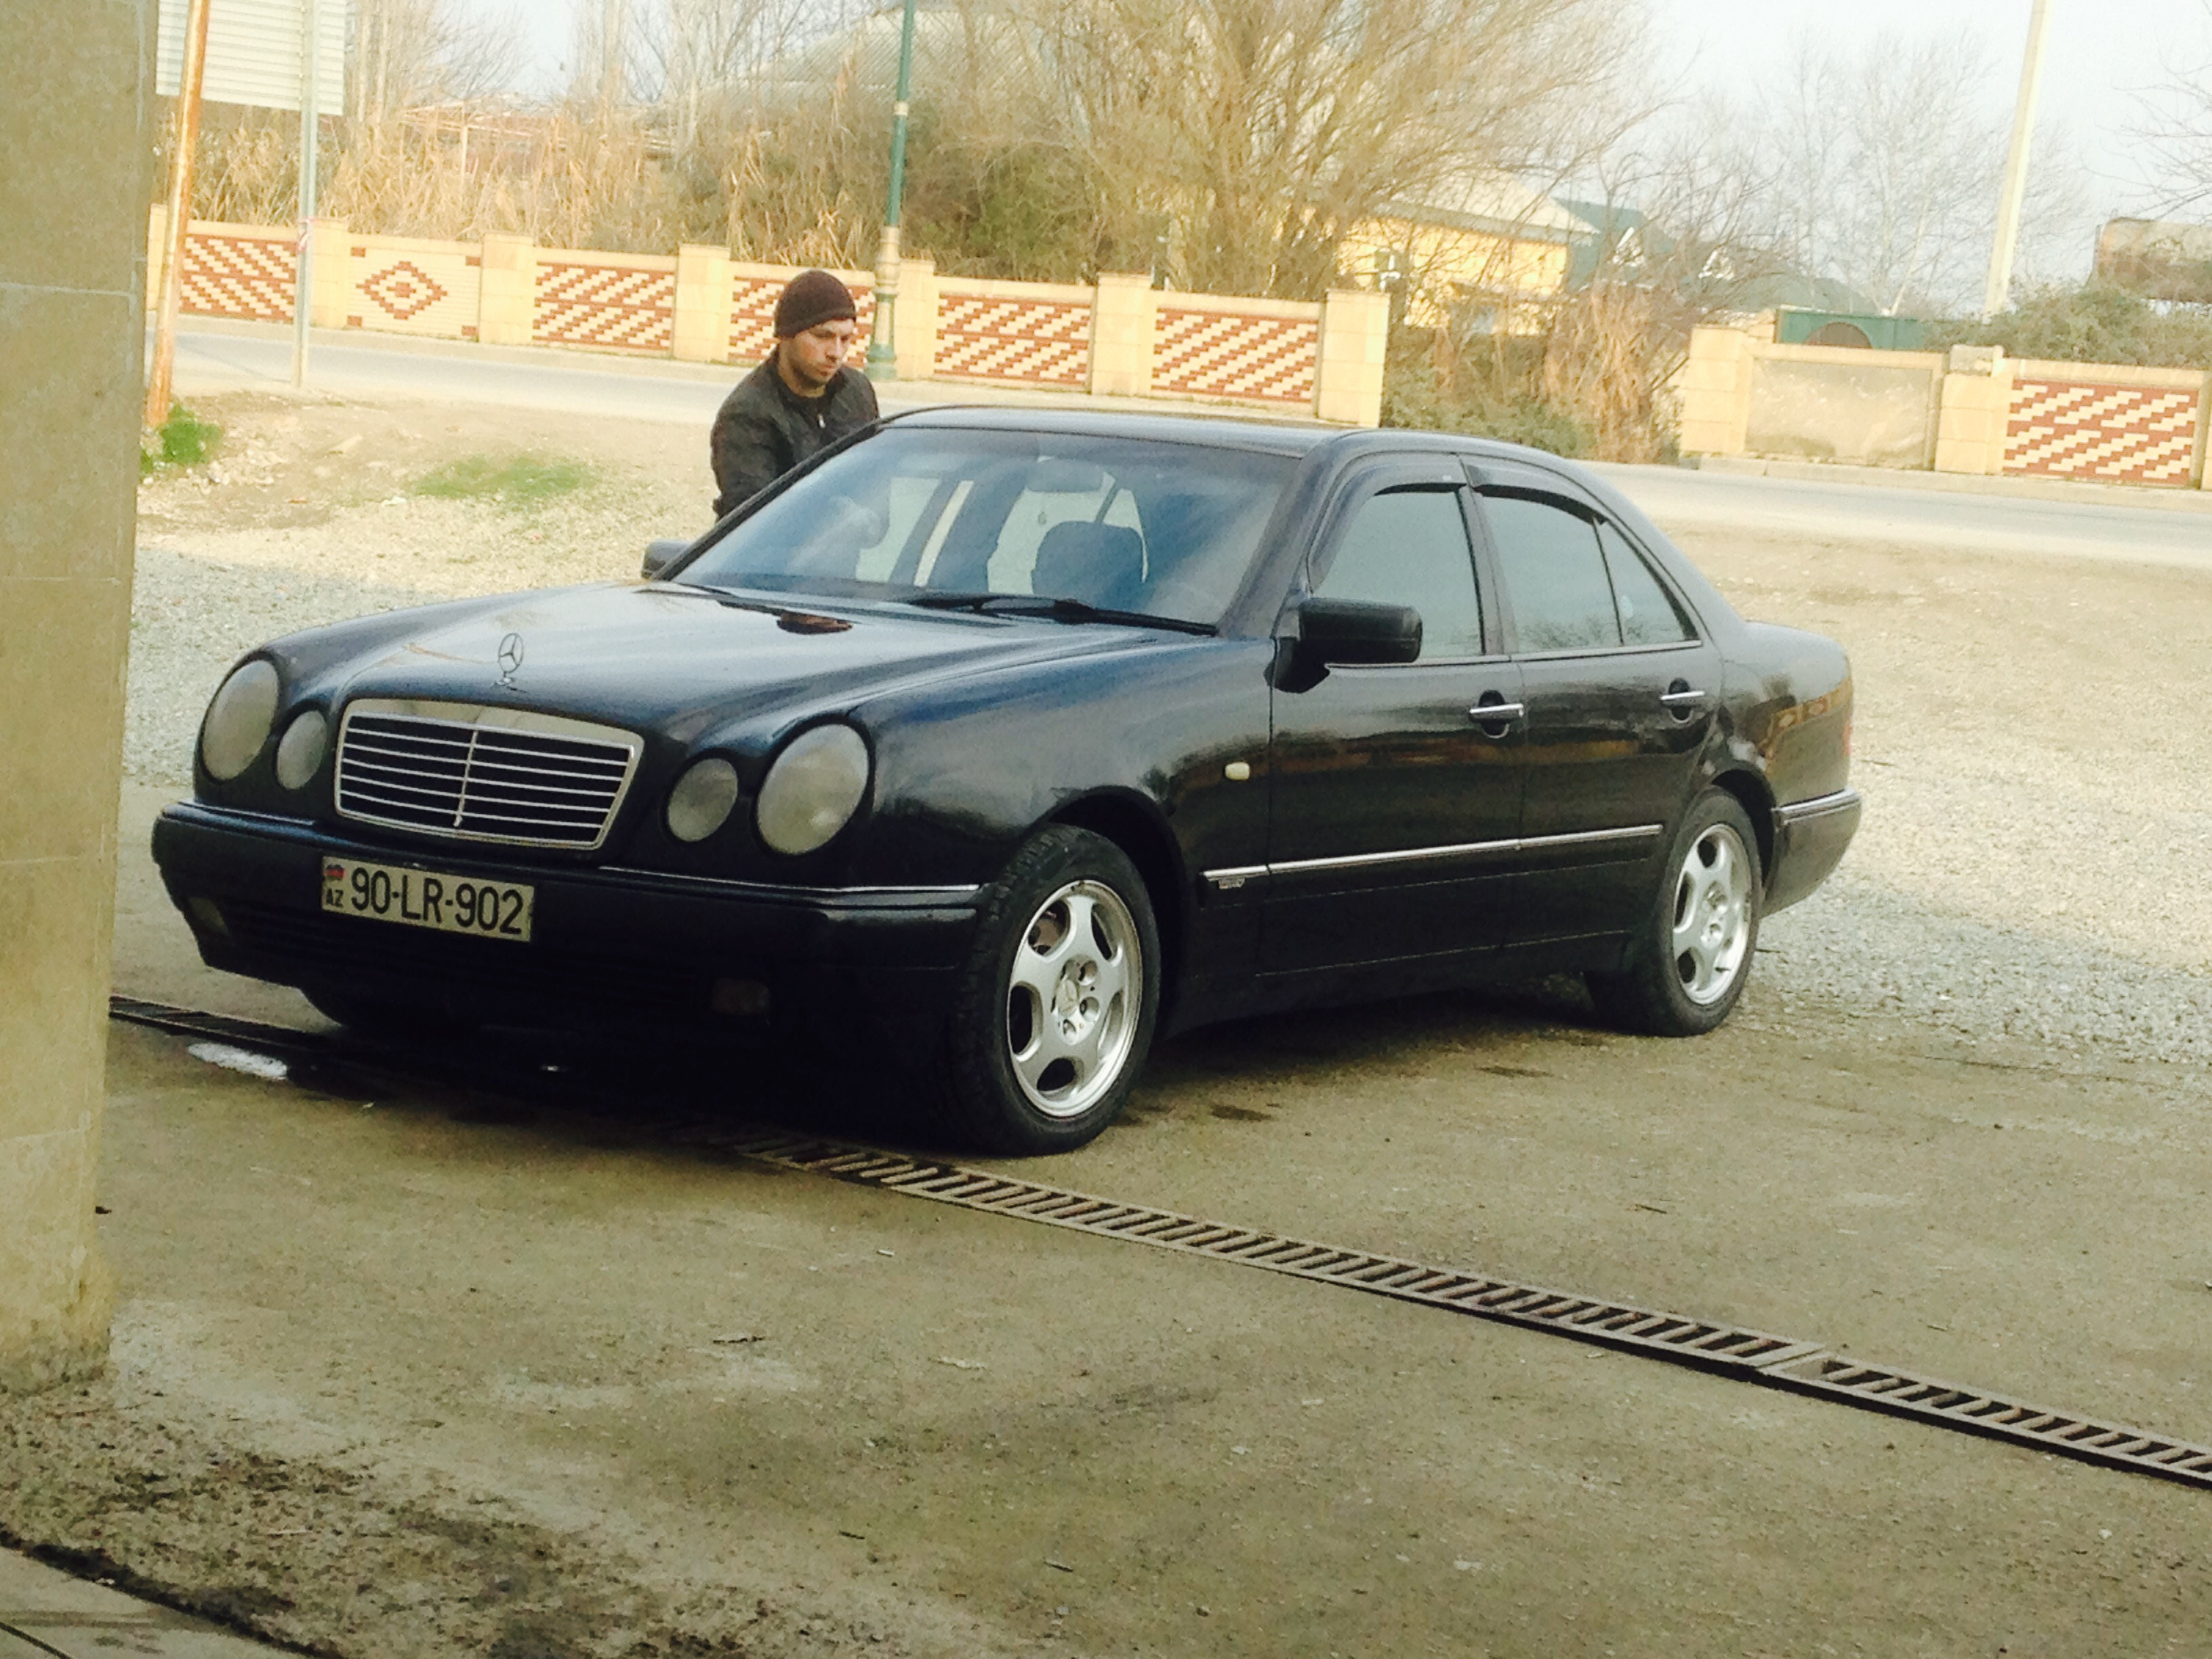 Mercedes-Benz E 220 2.2(lt) 1998 İkinci əl  $12000